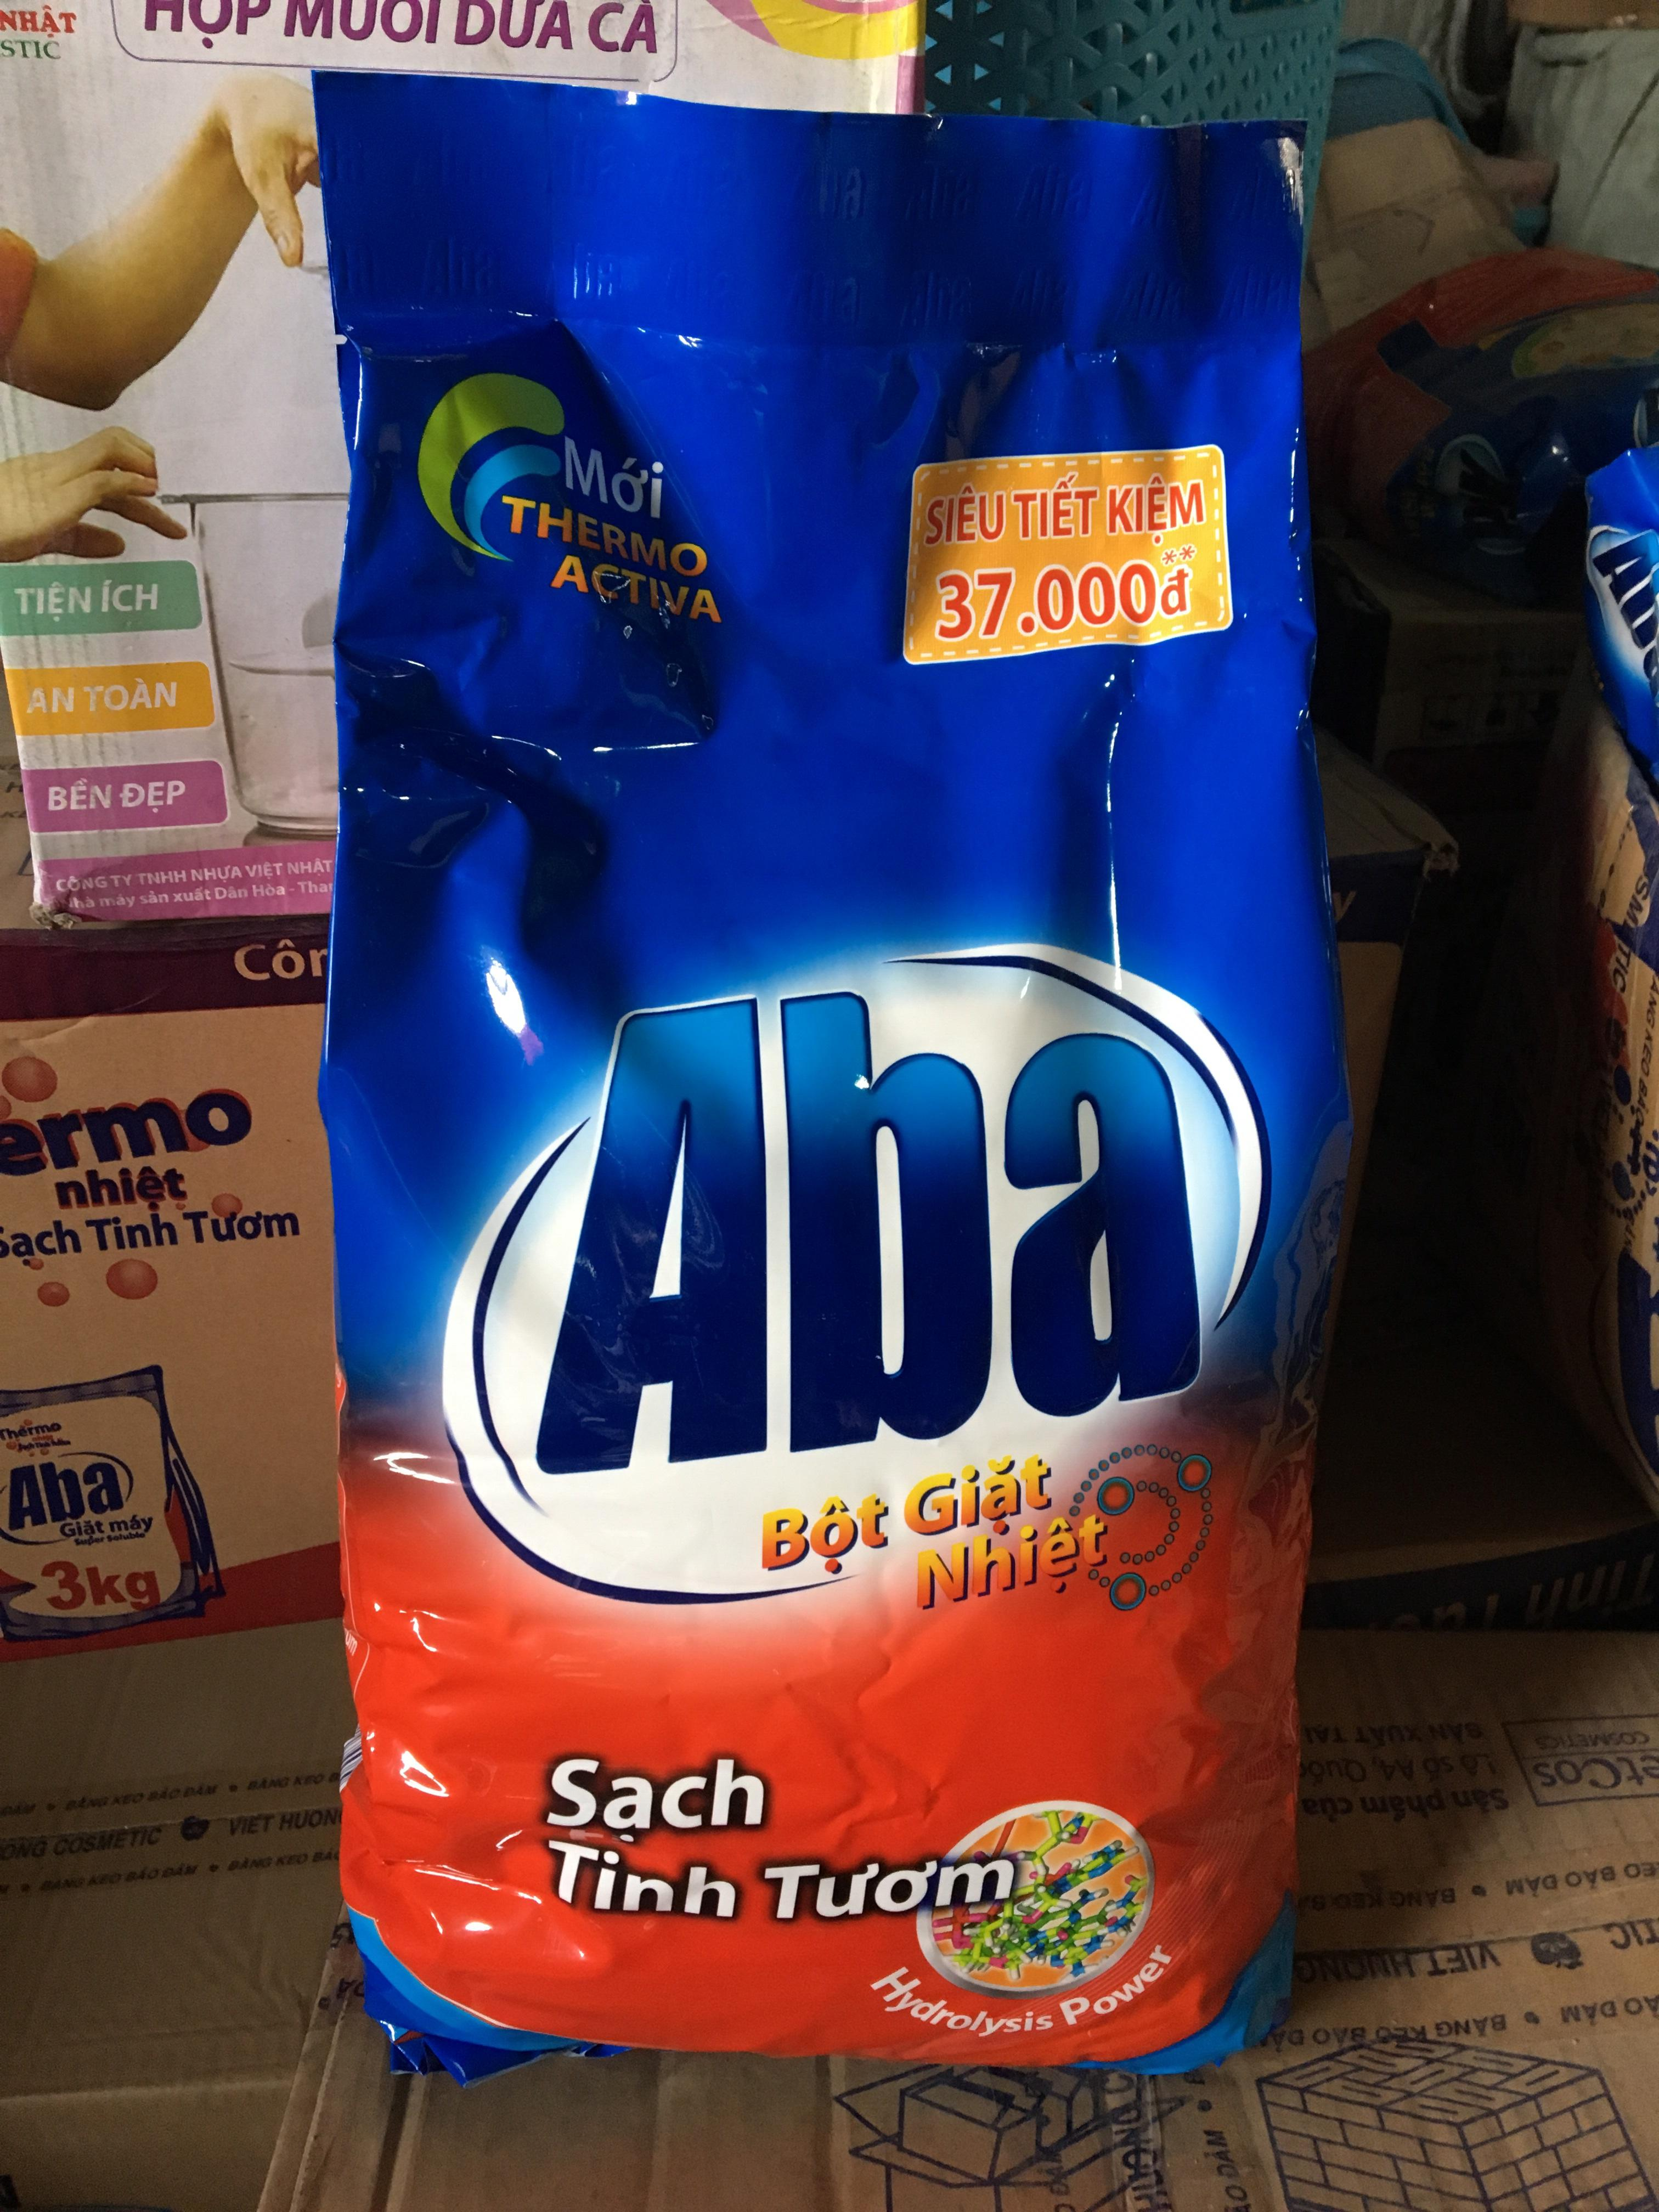 Voucher tại Lazada cho Bột Giặt Aba 6kg